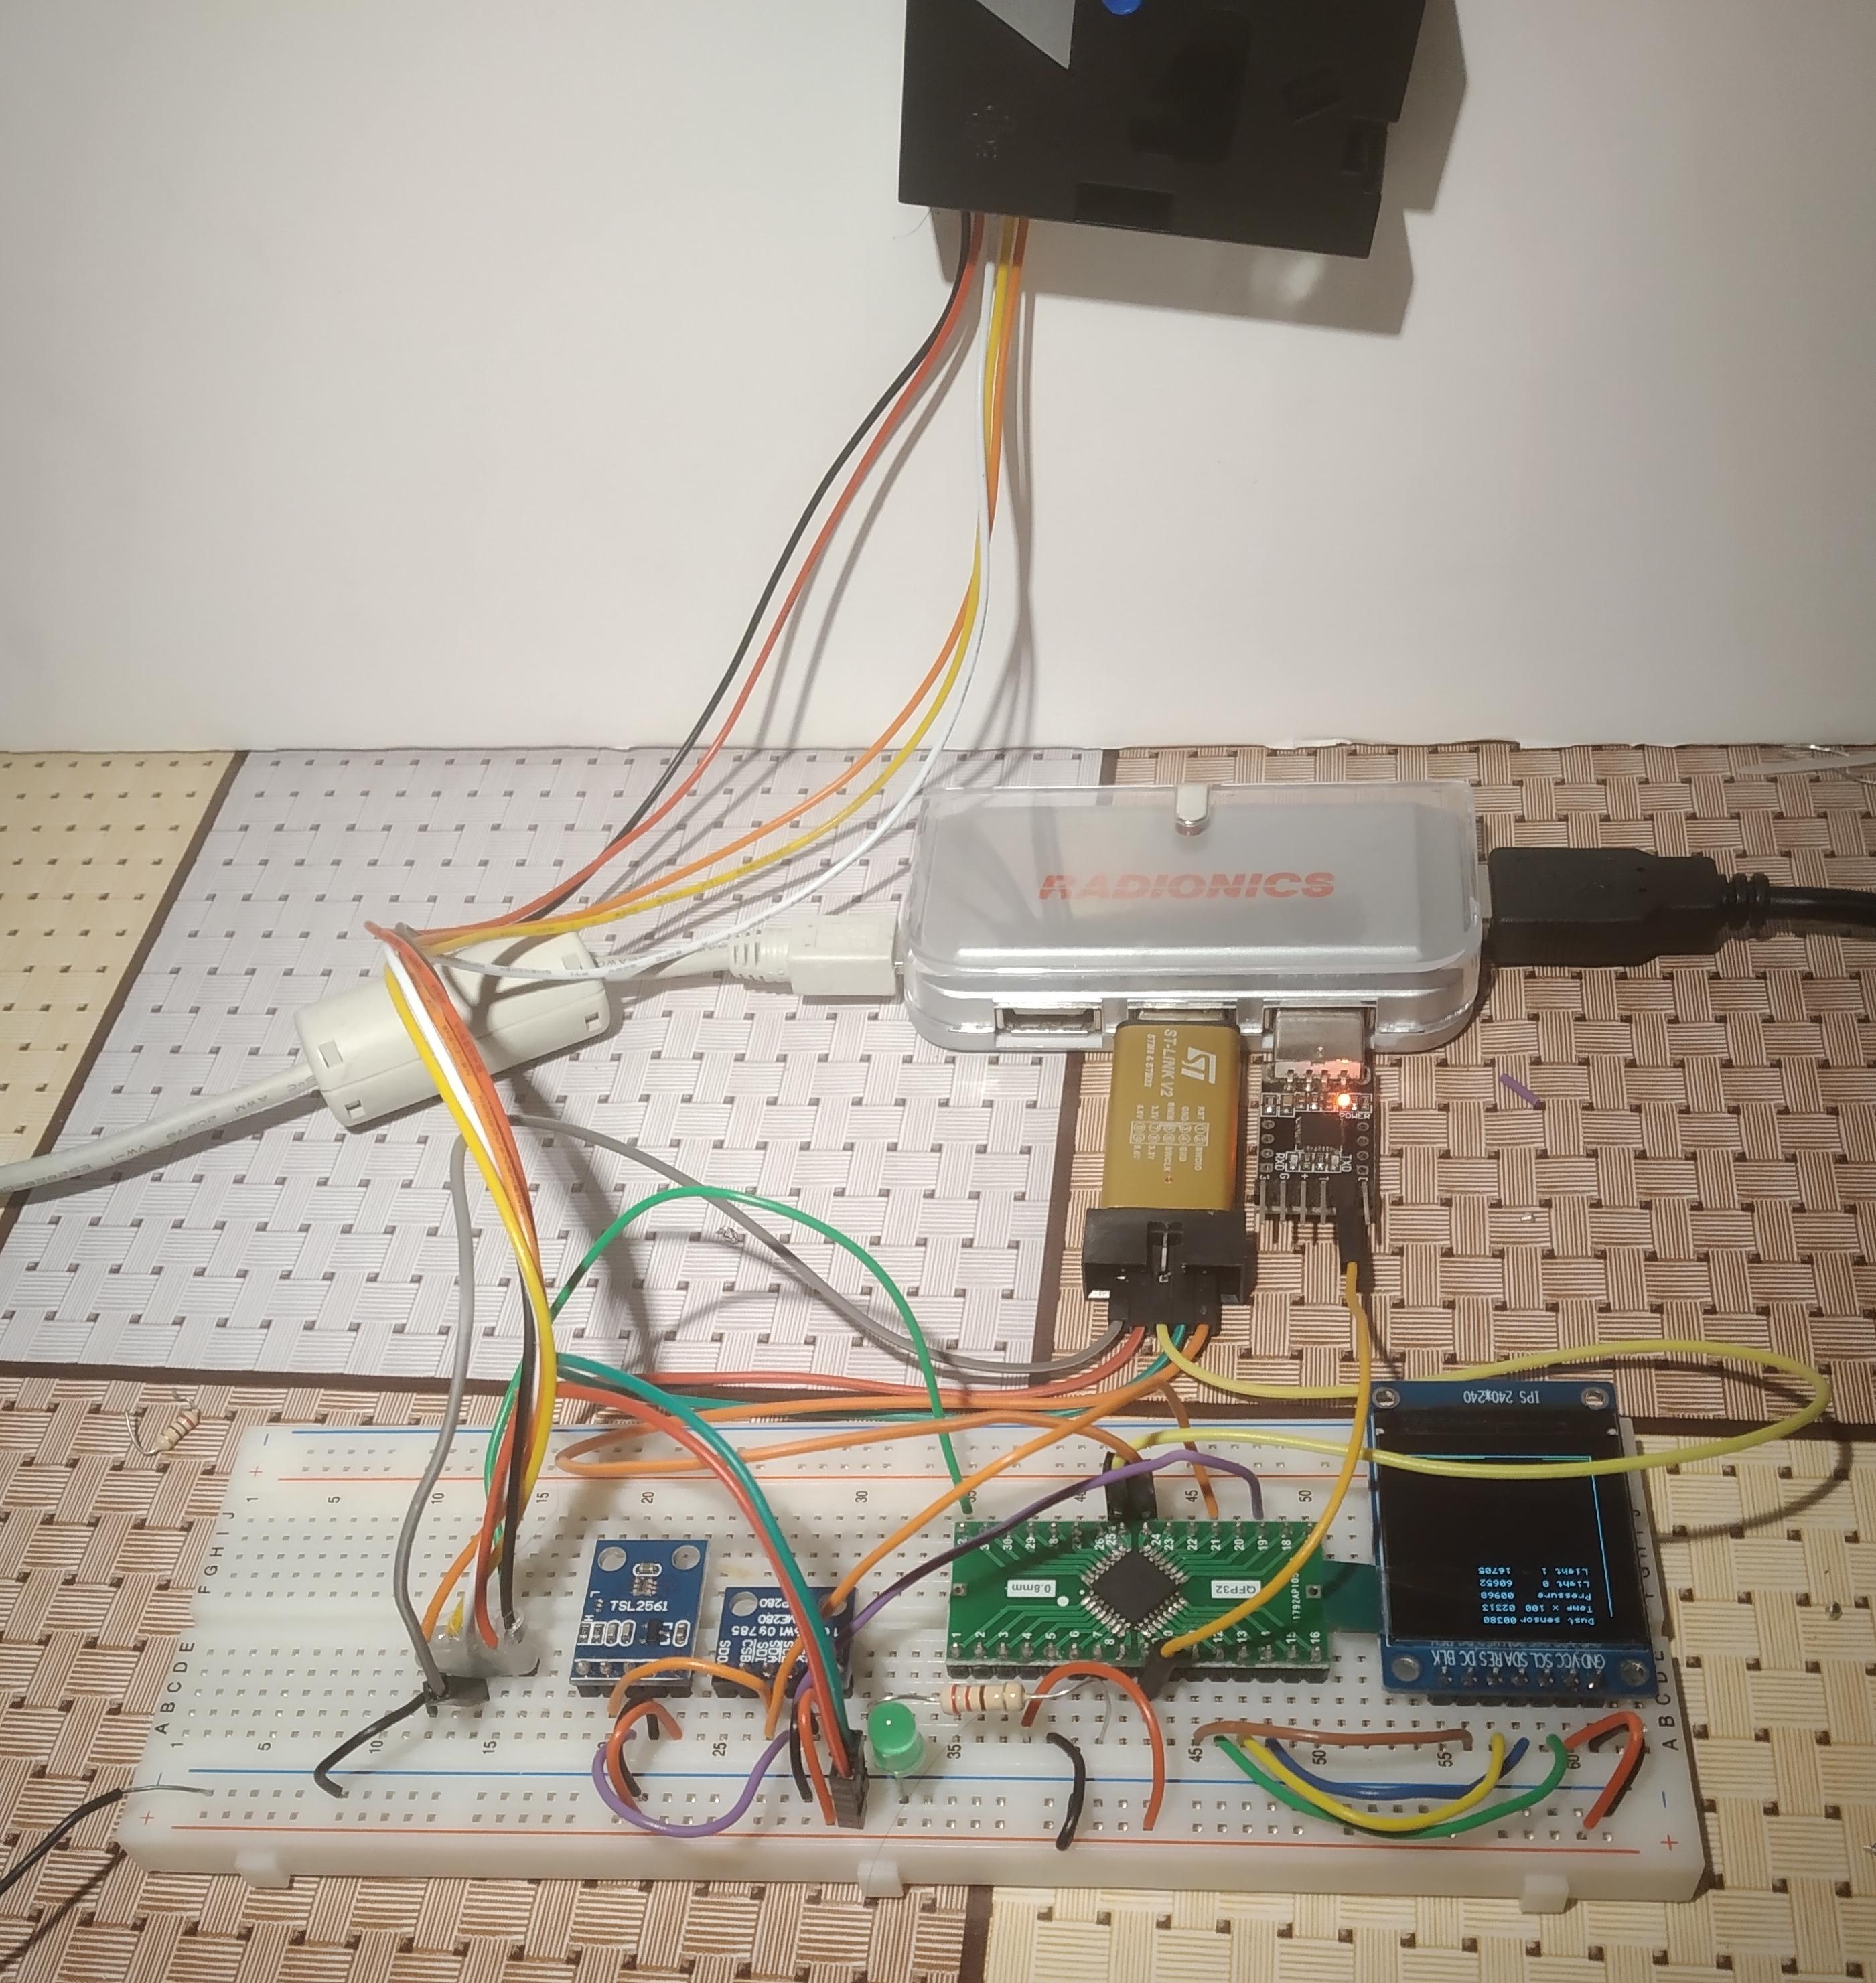 stm32g071_environment_assembled_board